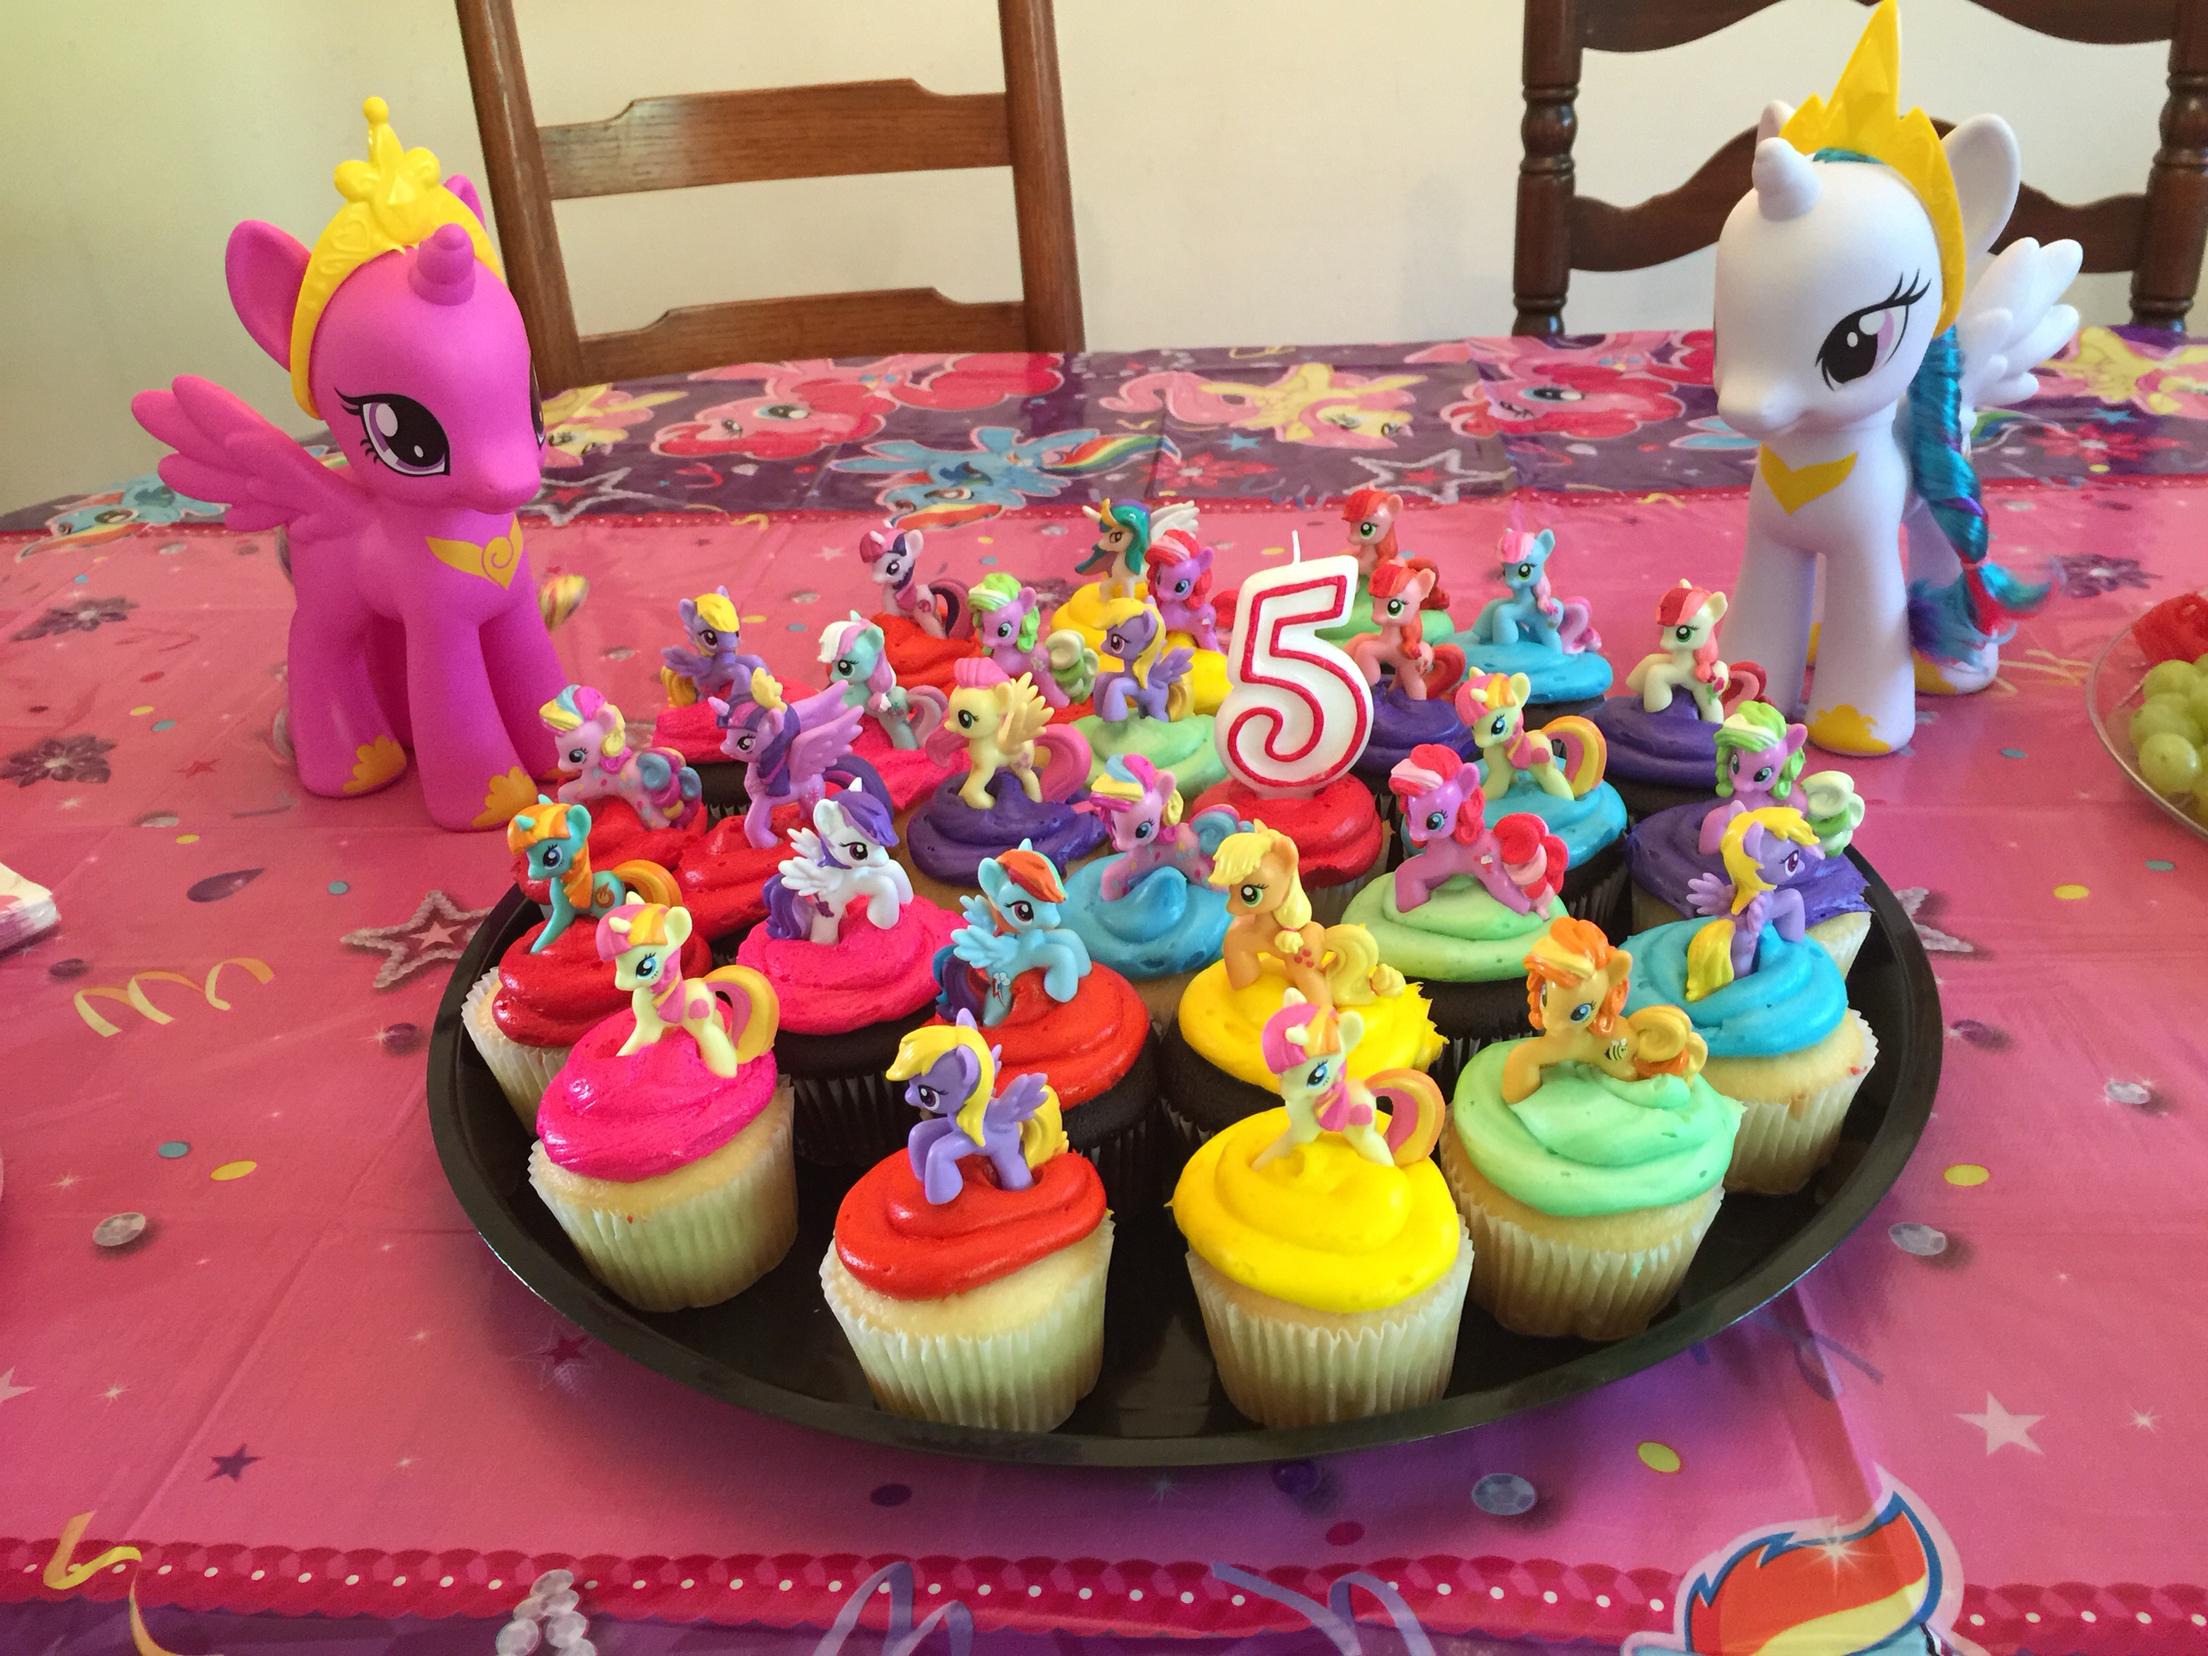 Cupcakes At Kroger Photo Bakery Cupcake Cakes Krogers Birthday Cake Moana Jpg 2208x1656